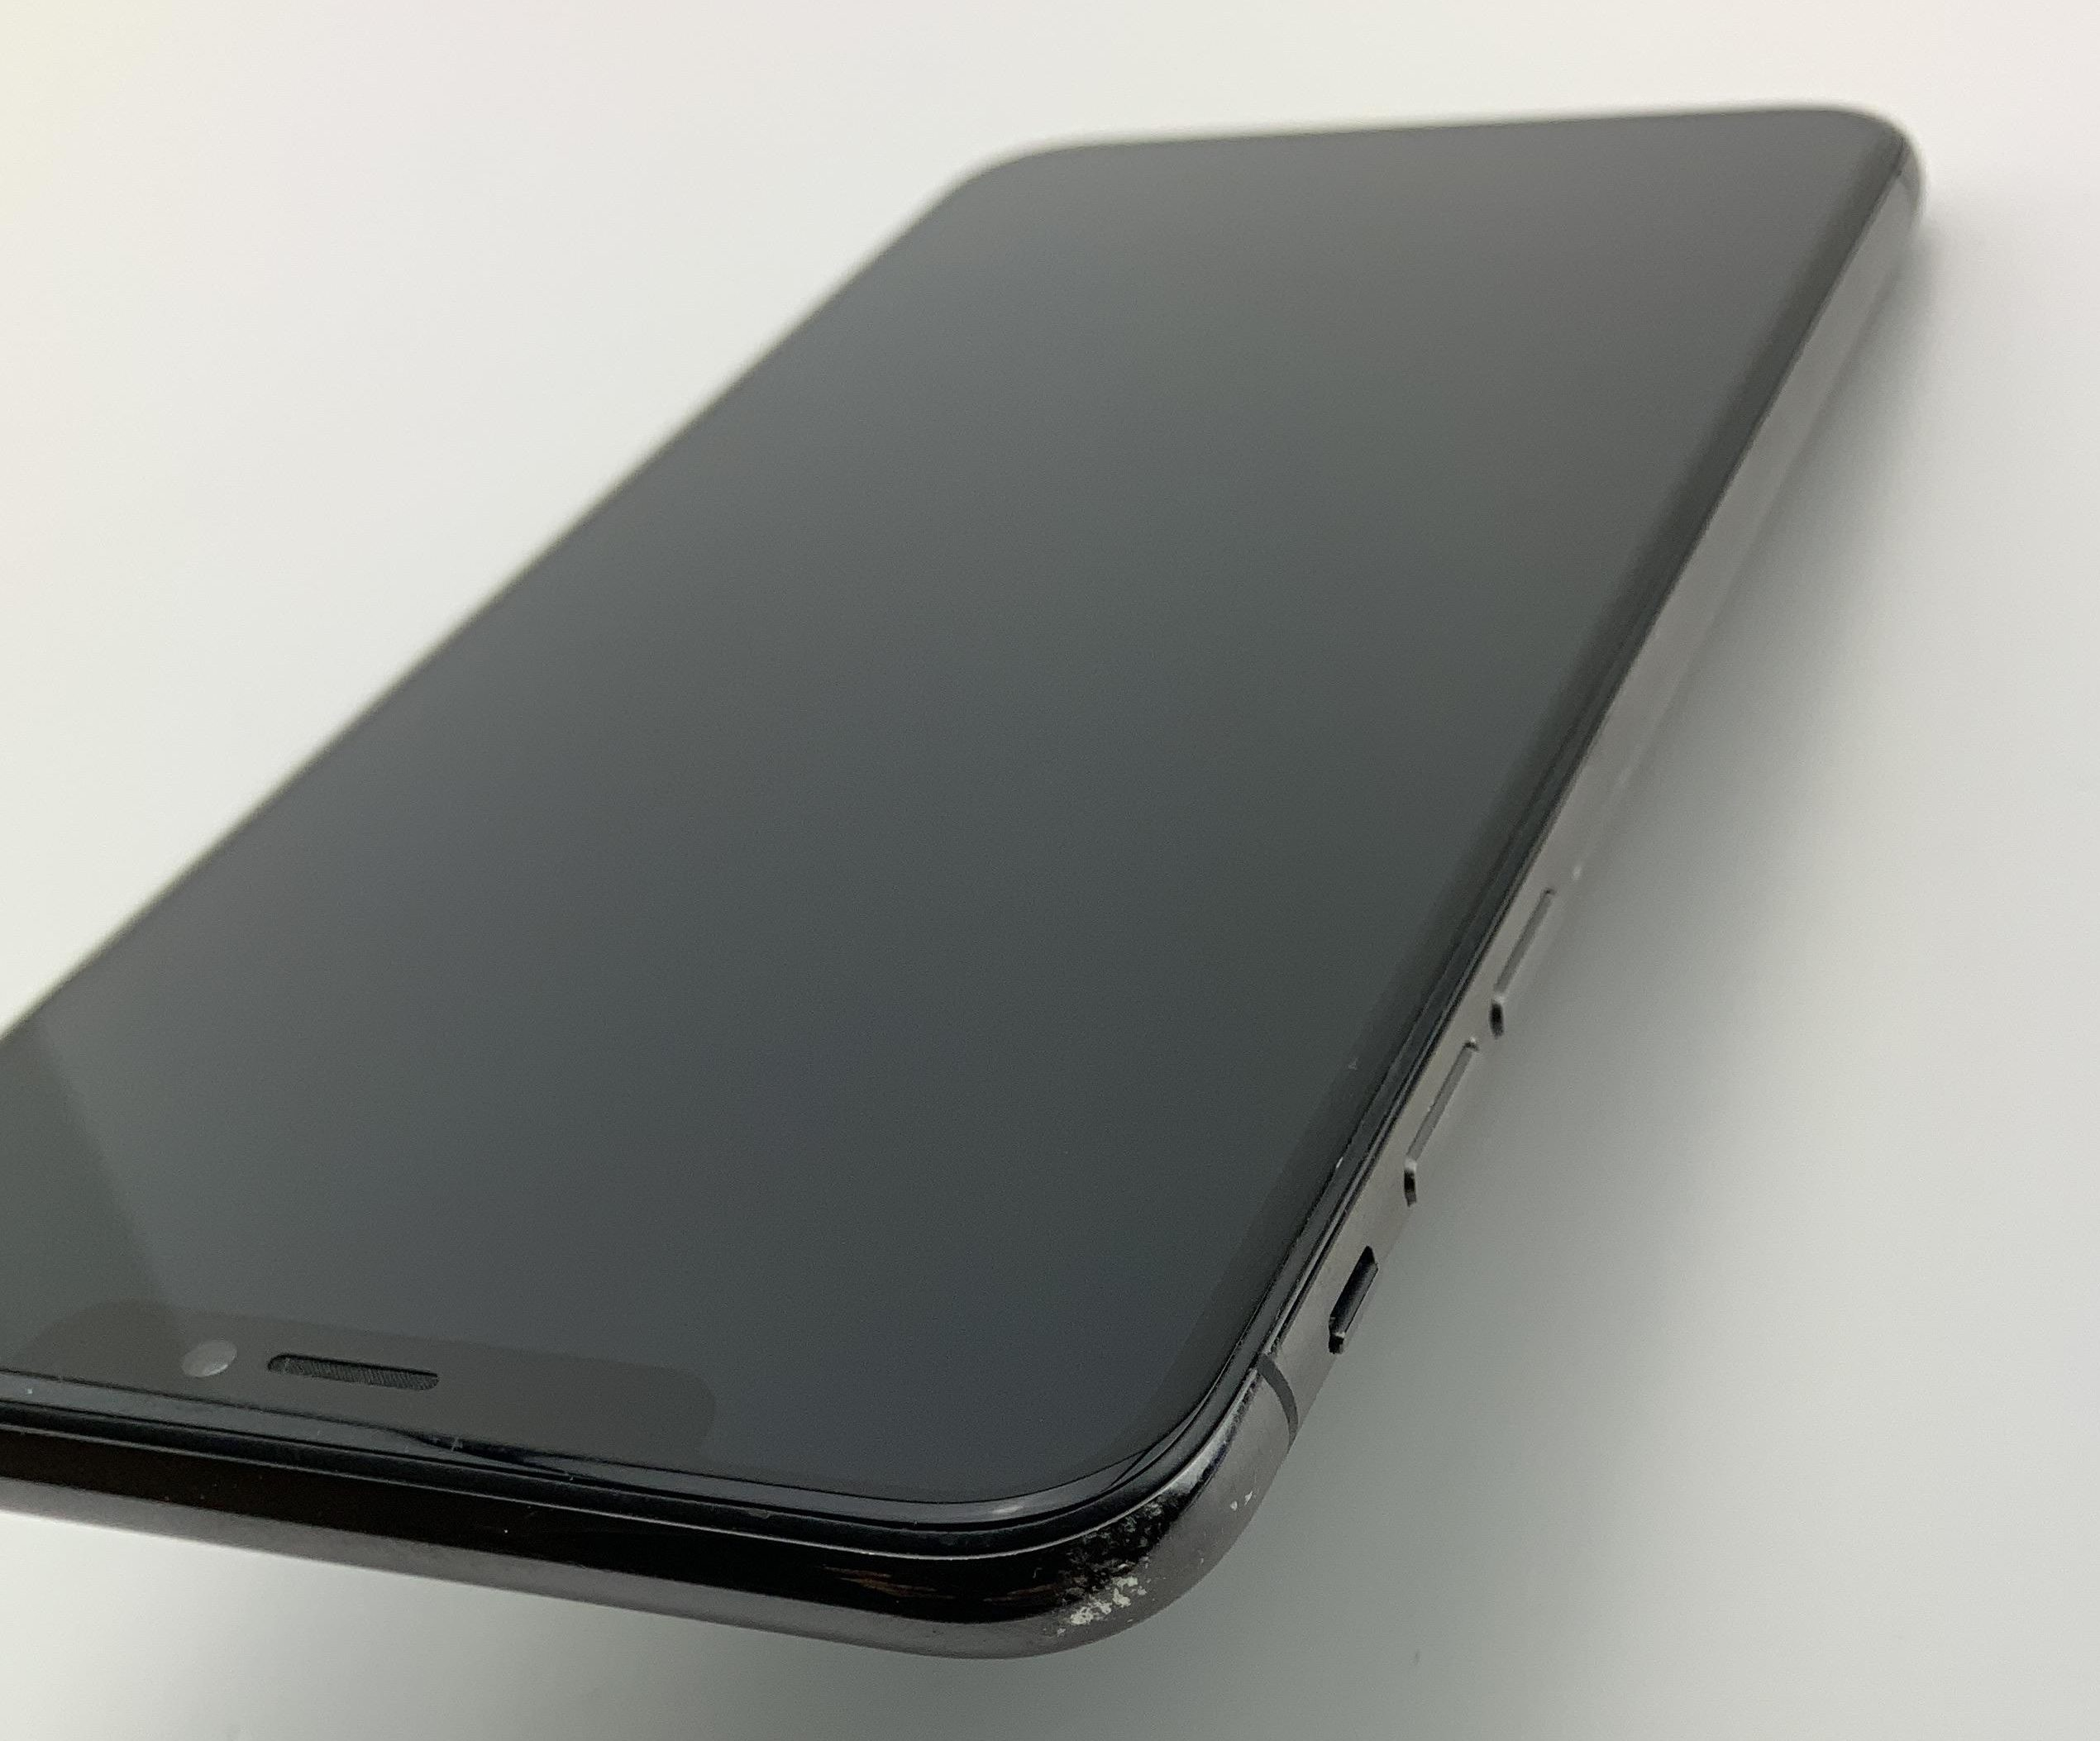 iPhone XS Max 64GB, 64GB, Space Gray, Bild 5